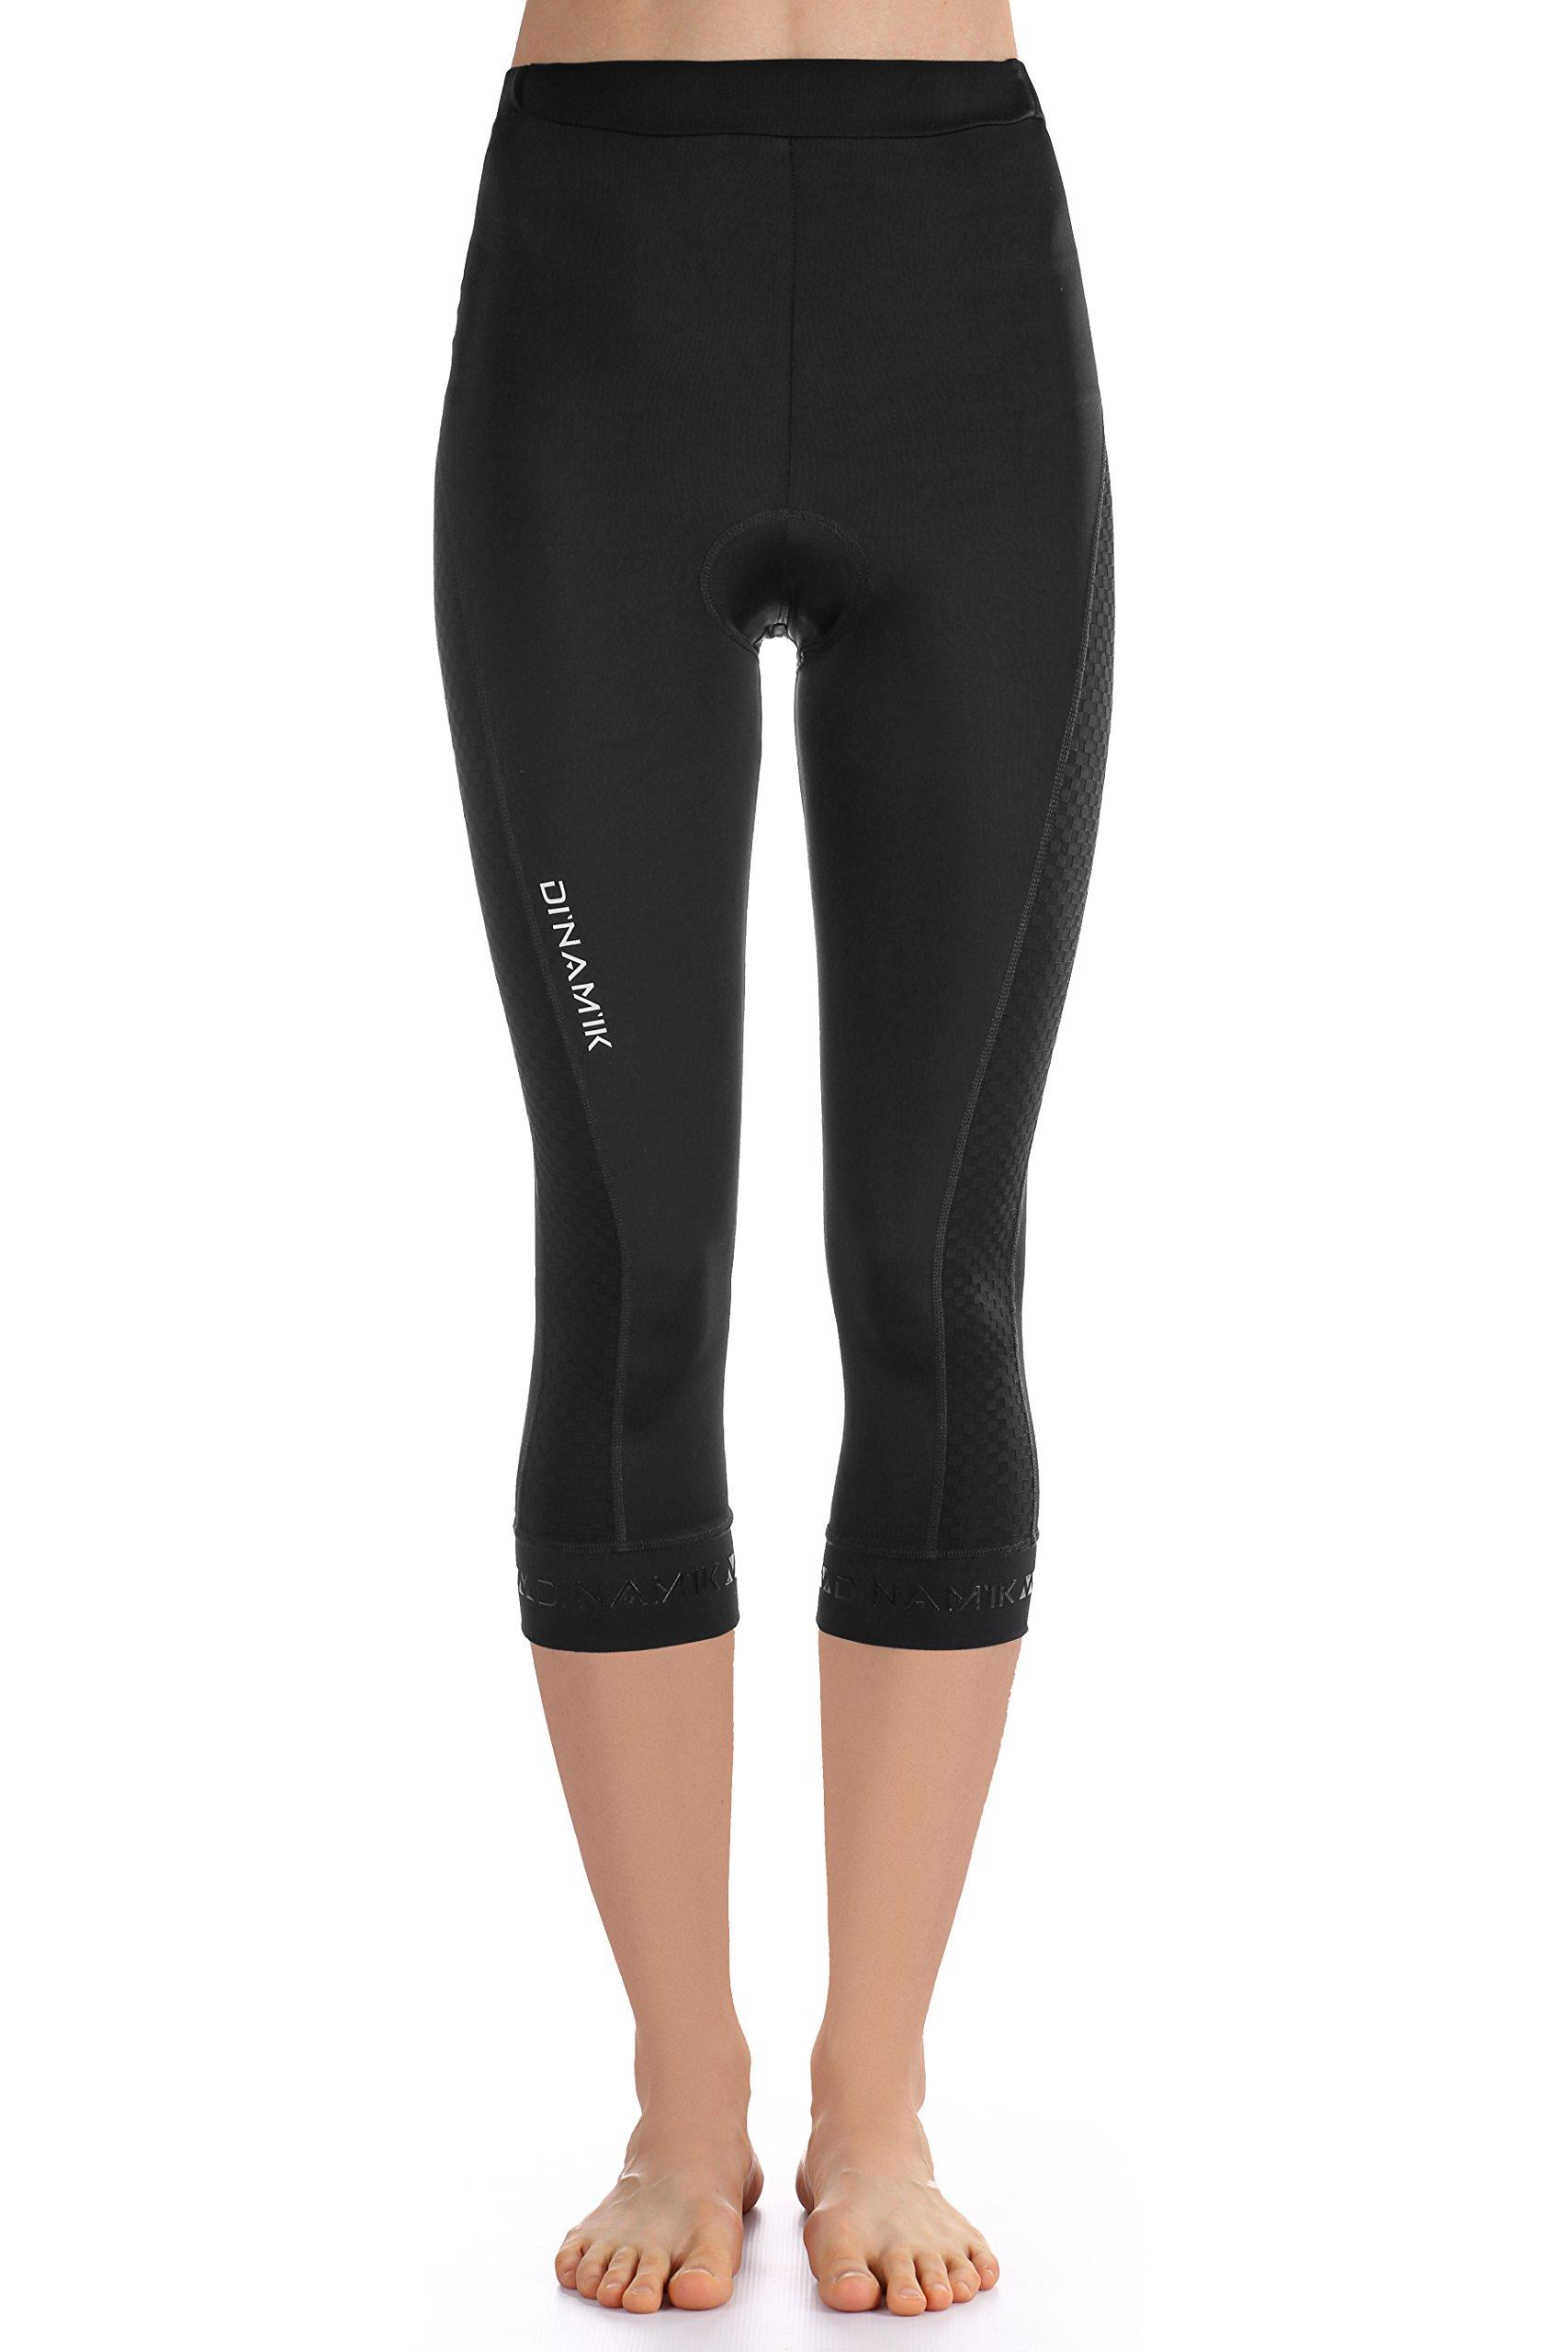 Dinamik Womens Cycling 3/4 Bike Tights Light Leggings Extra Padded Half Pants EVO PRO (X-Small, Black)